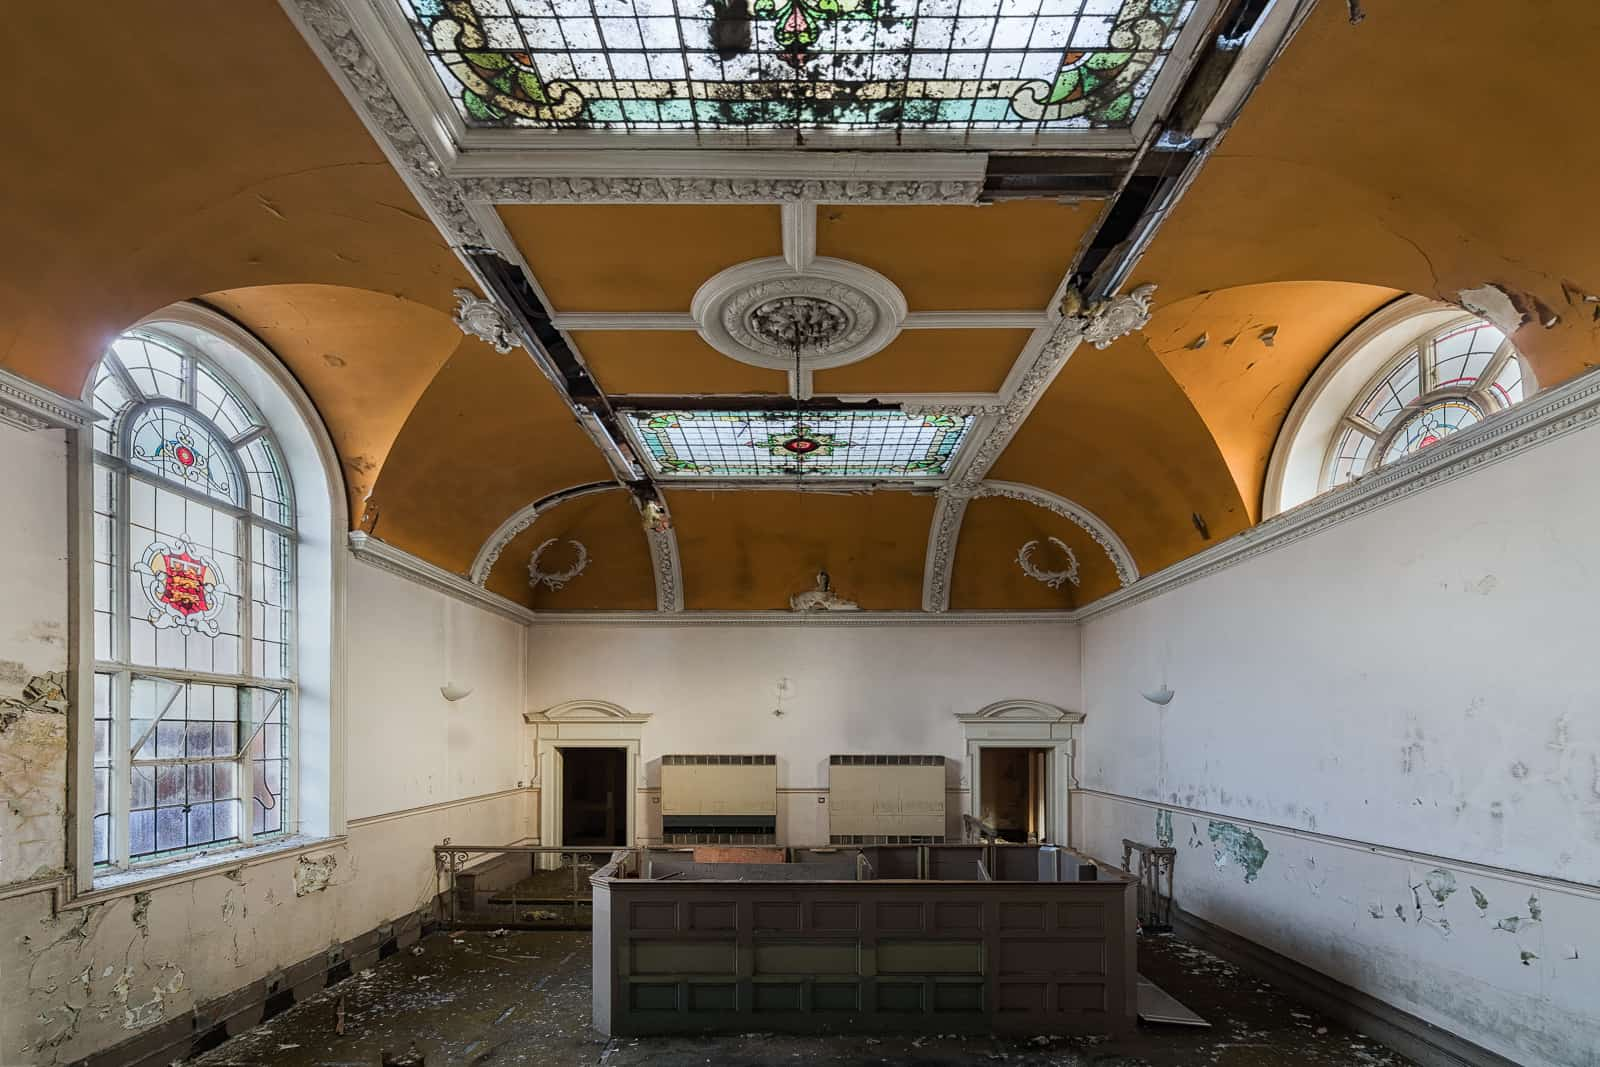 Edwardian Magistrates Court, England - Obsidian Urbex Photography | Urban Exploration